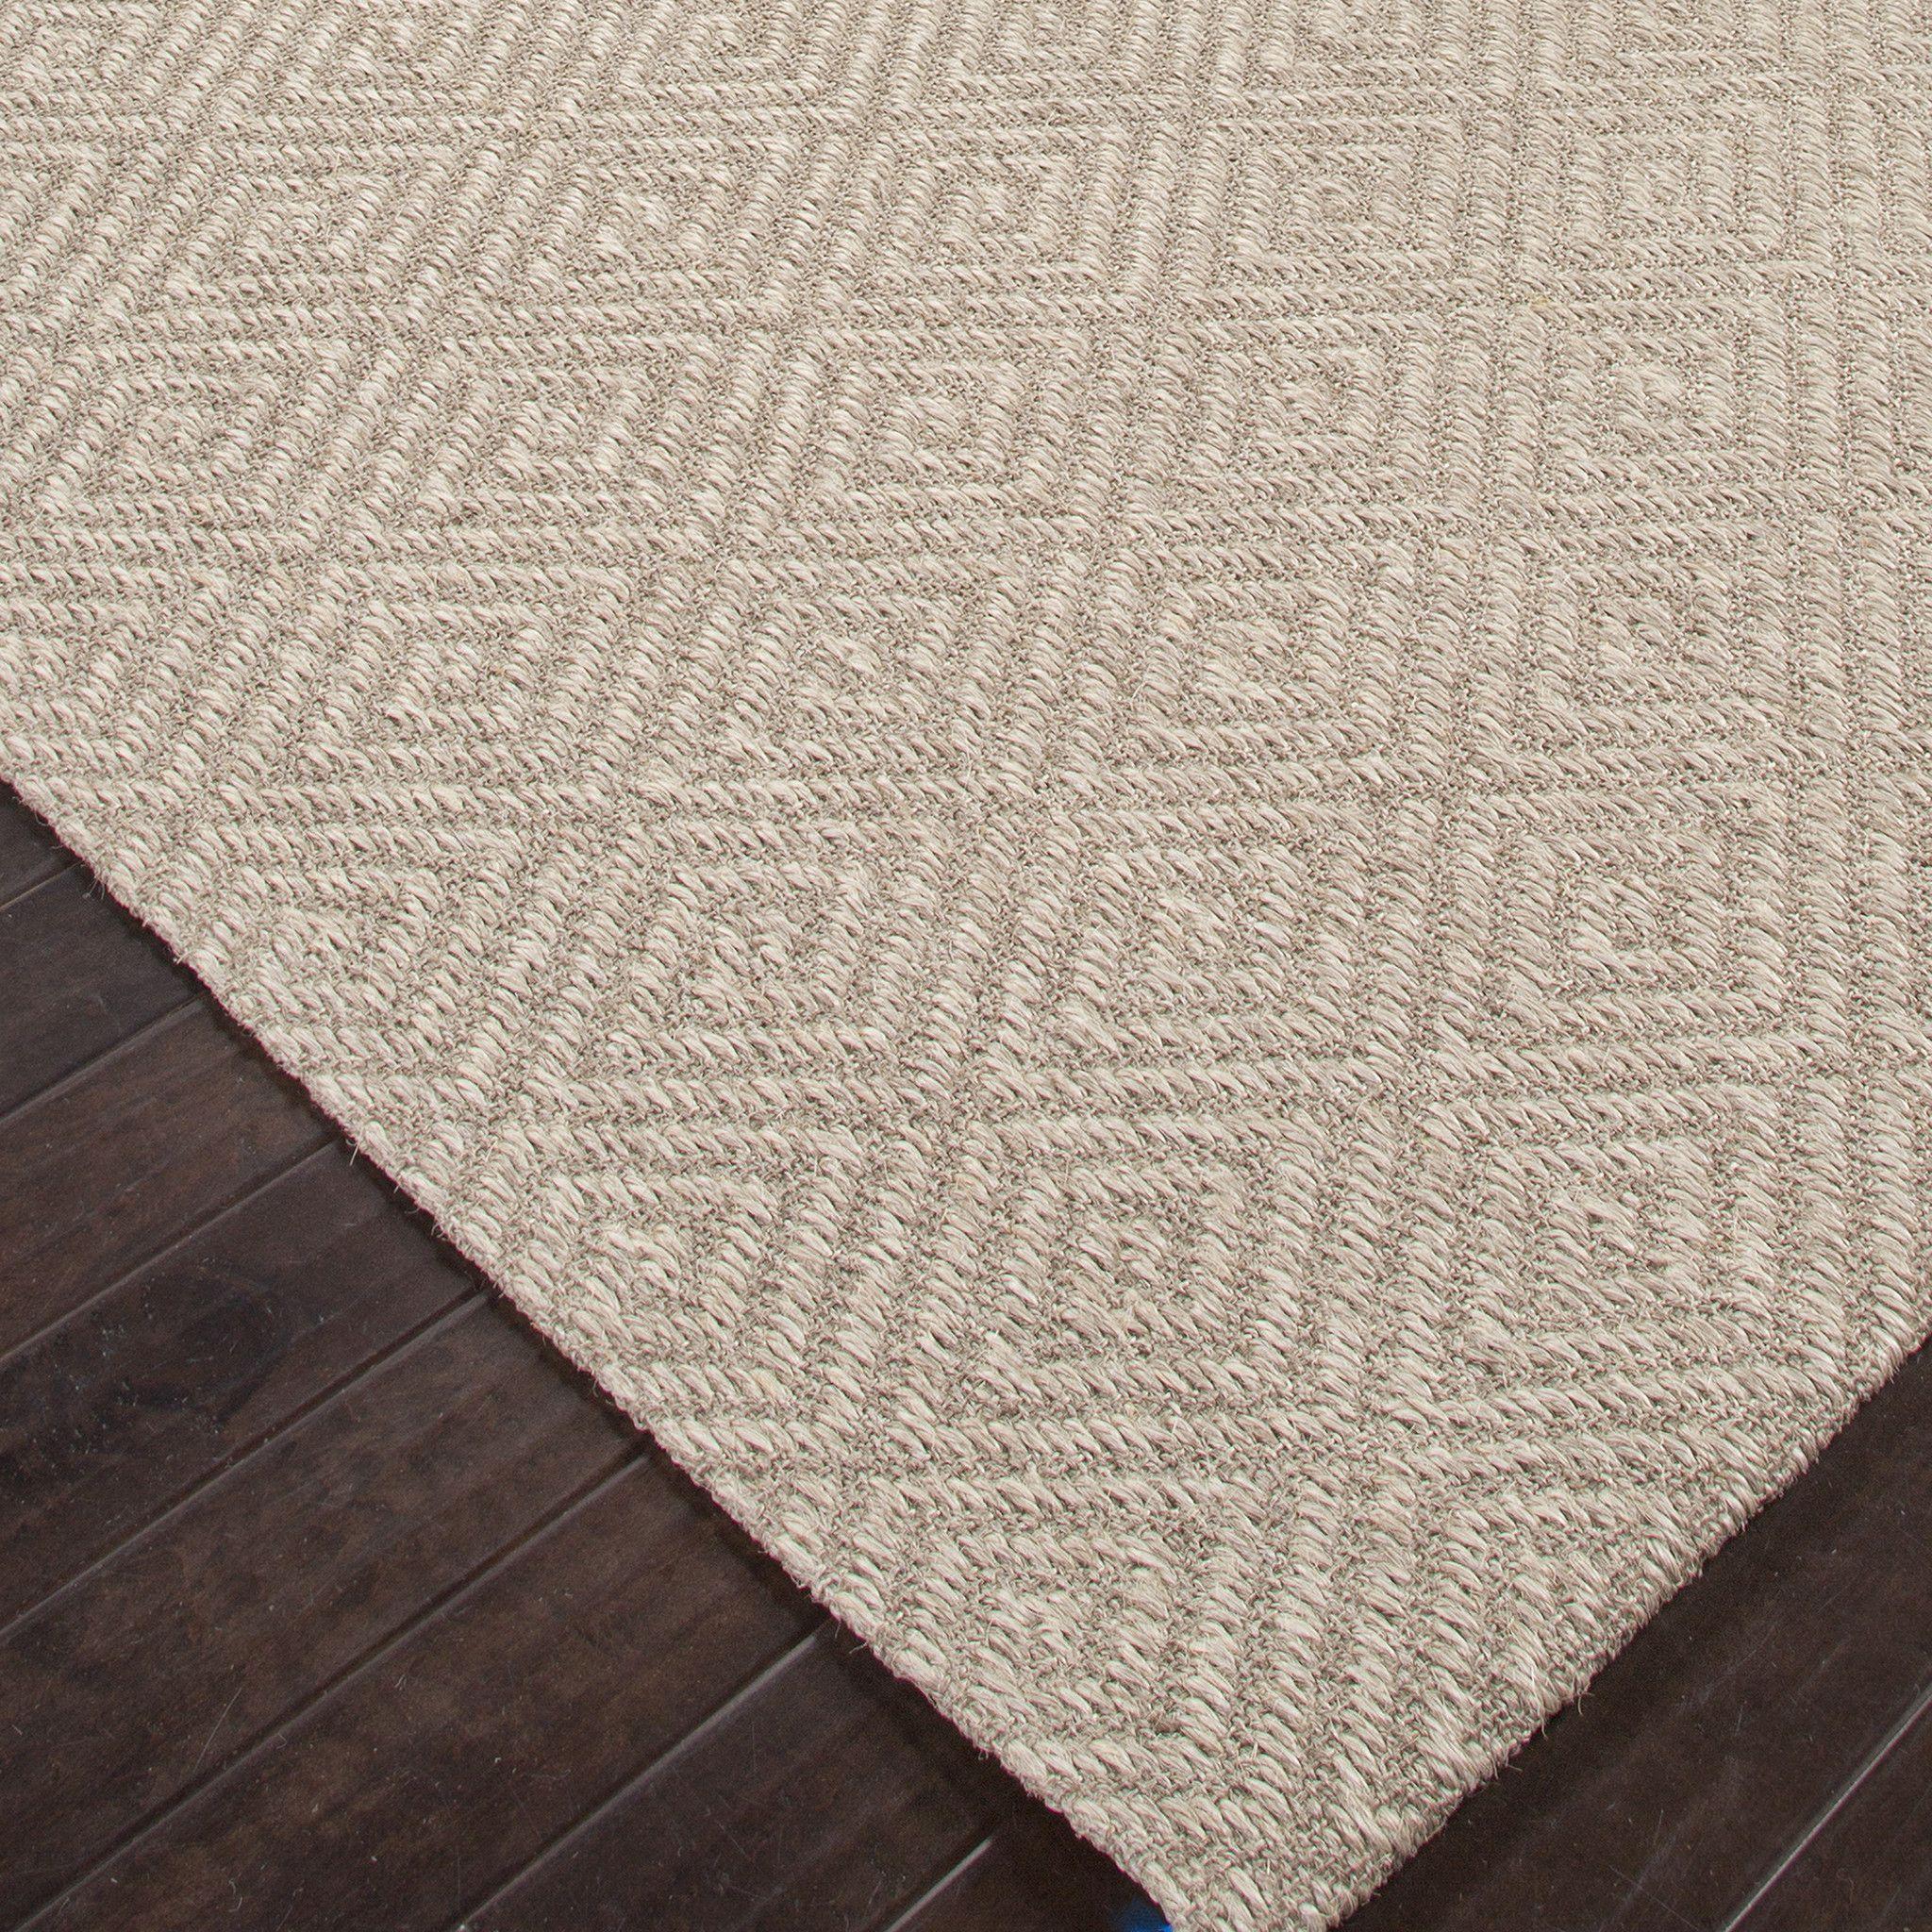 Naturals Tobago Rug Rugs On Carpet Rugs Patterned Carpet